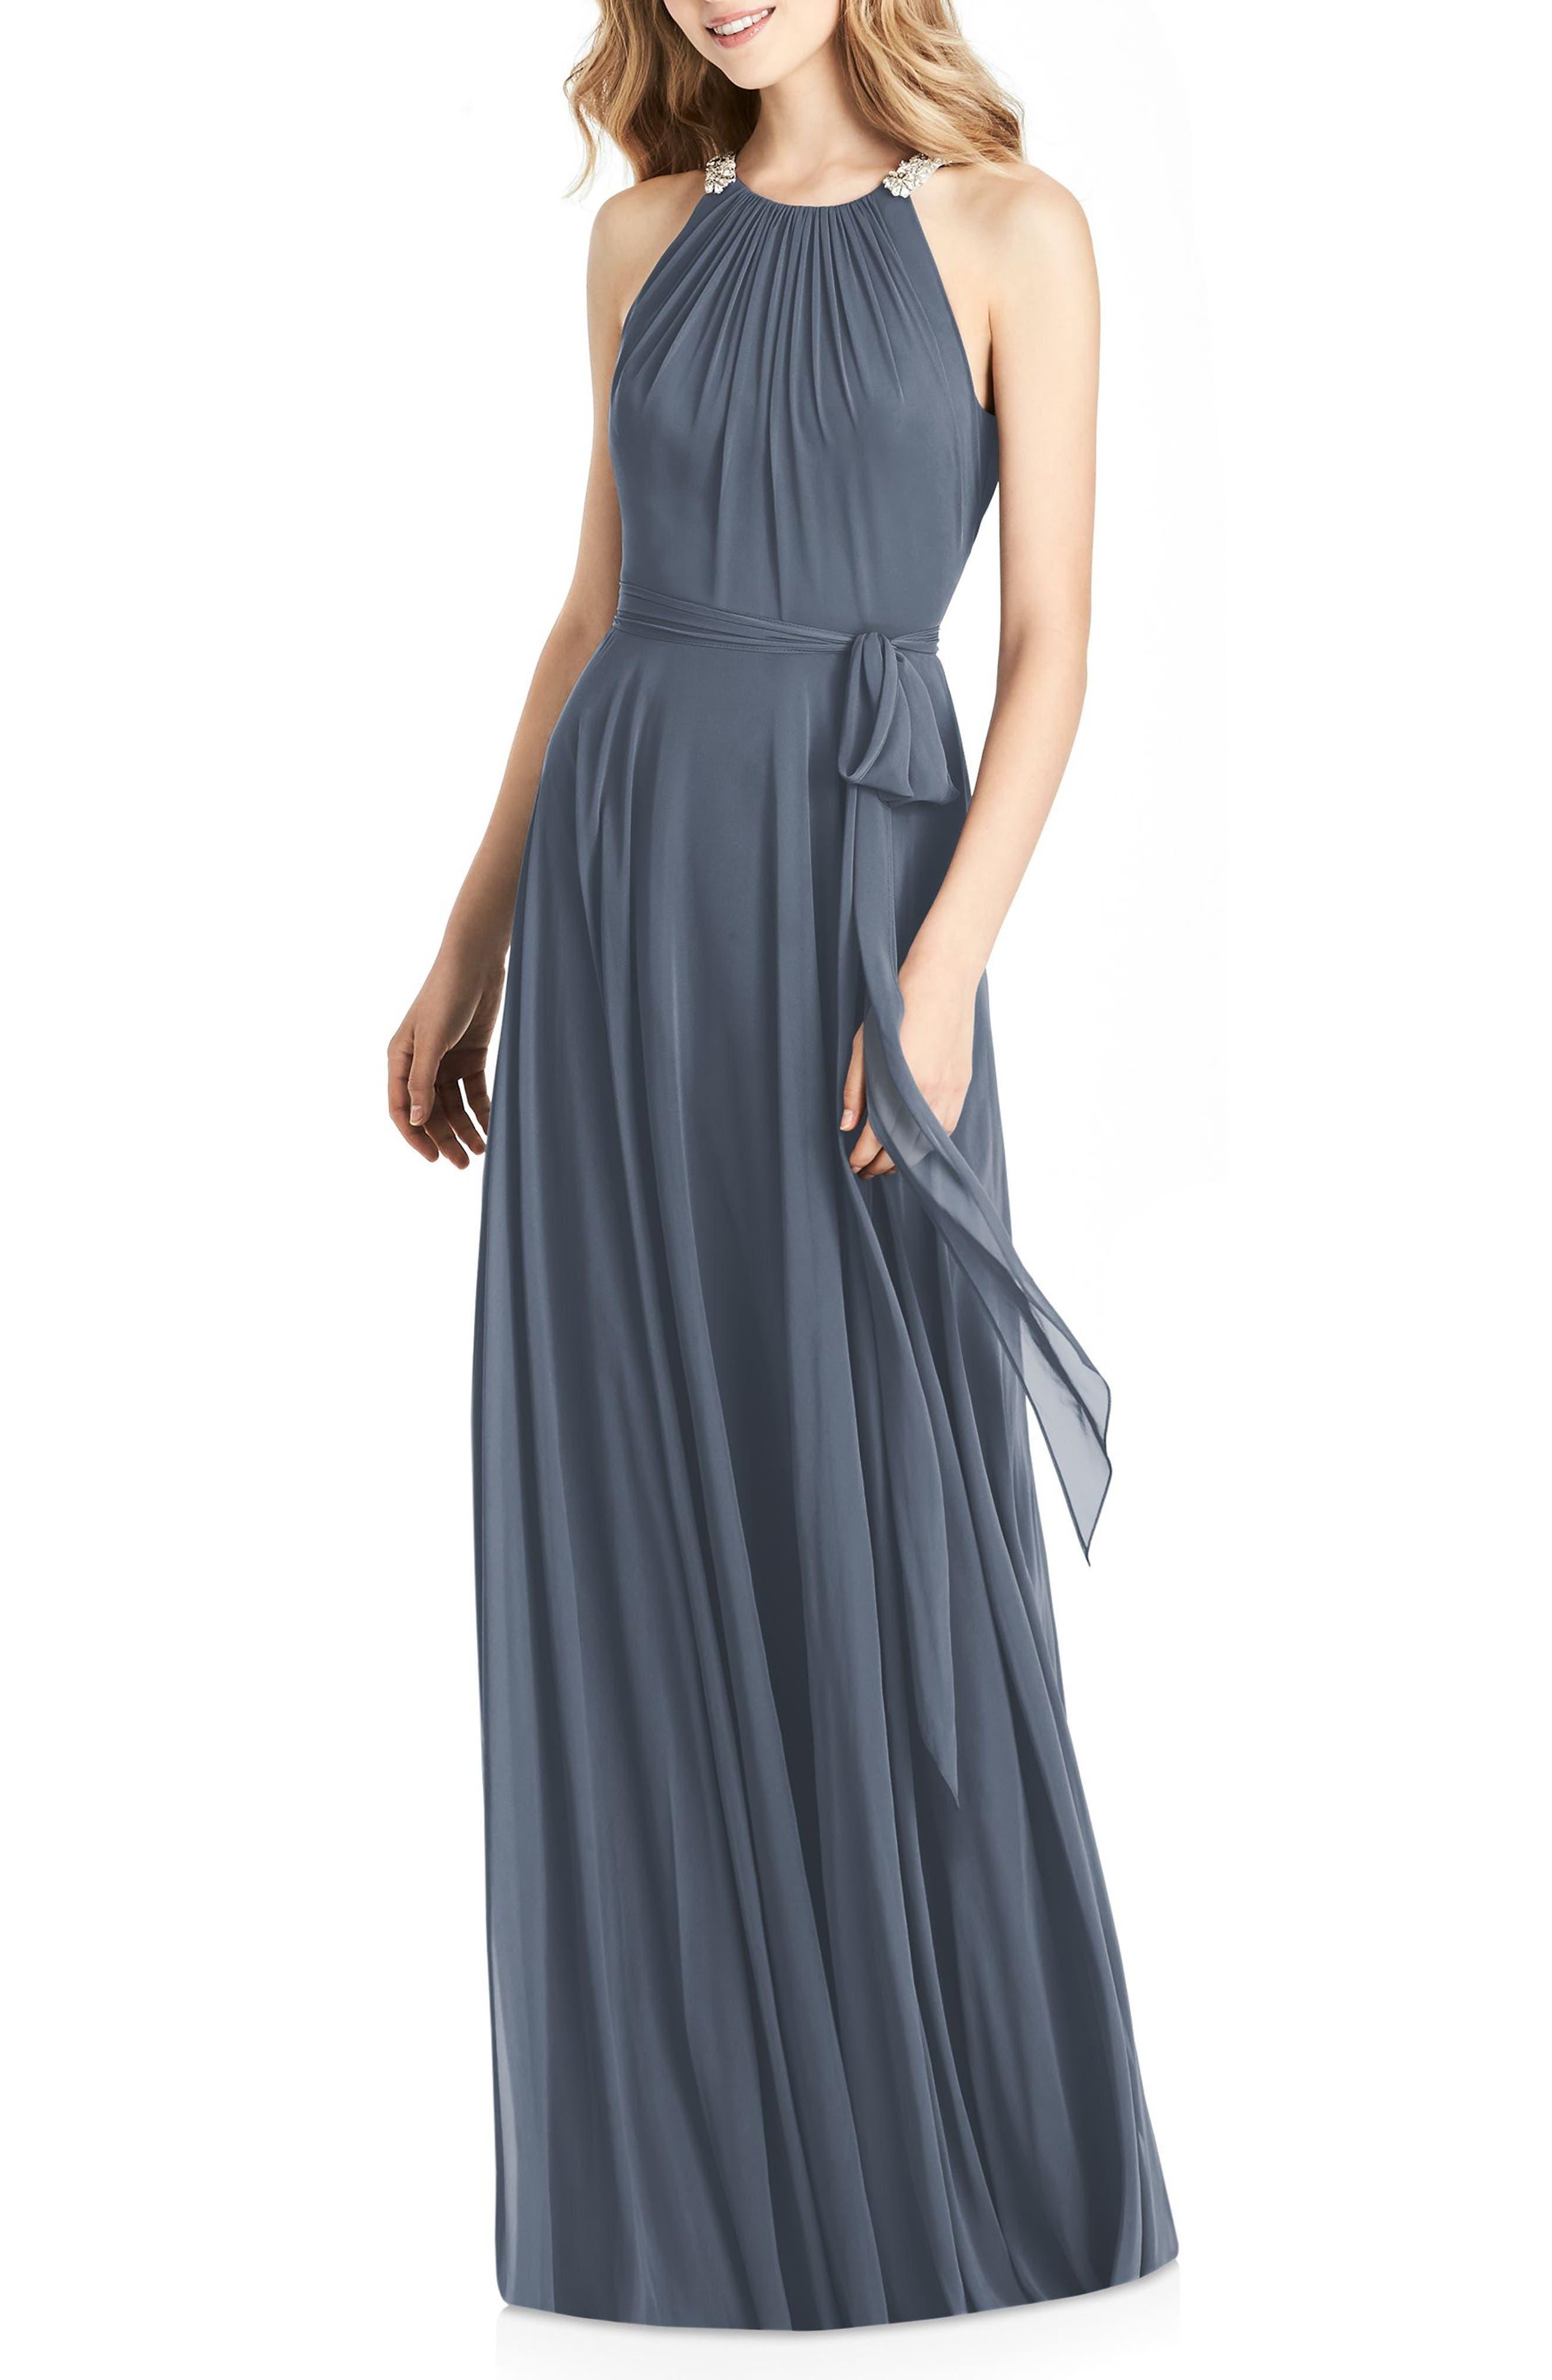 JENNY PACKHAM,                             Beaded Strap Chiffon Gown,                             Main thumbnail 1, color,                             SILVERSTONE